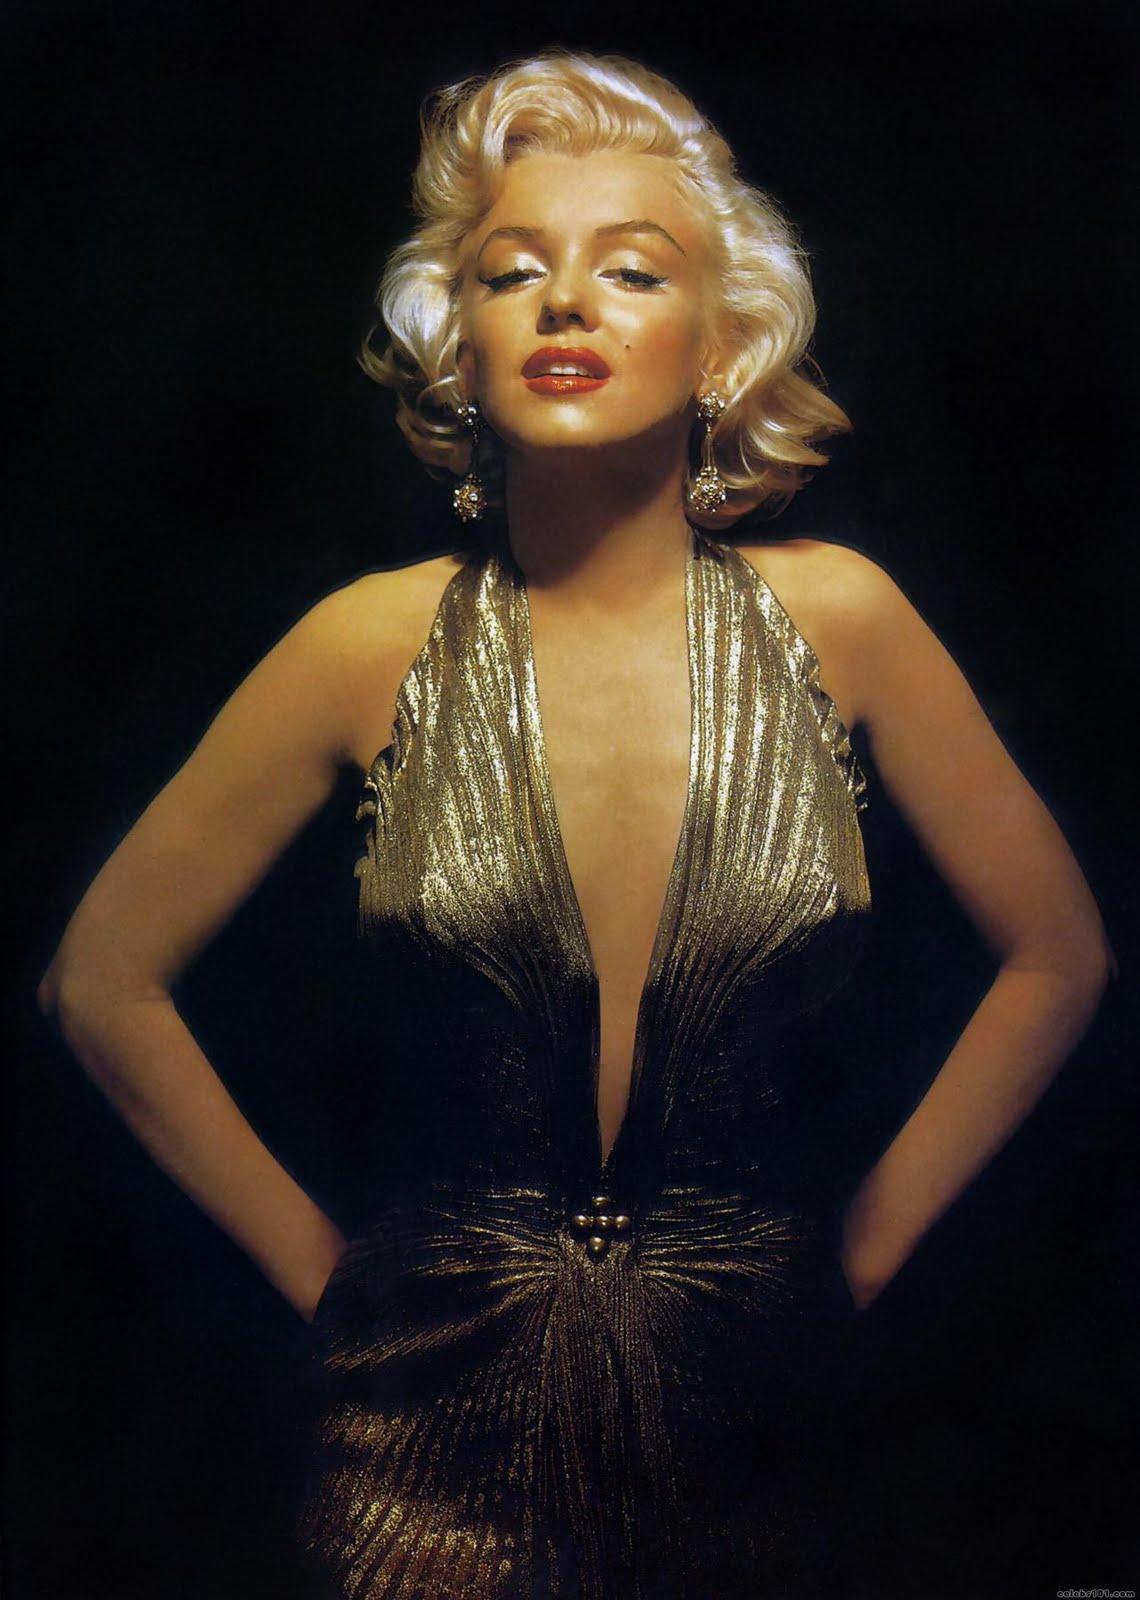 http://1.bp.blogspot.com/-D_KS1EMiPPg/TfJ6gus3HZI/AAAAAAAAFrc/F7CqAaqm1Fc/s1600/Marilyn+Monroe+110.jpg